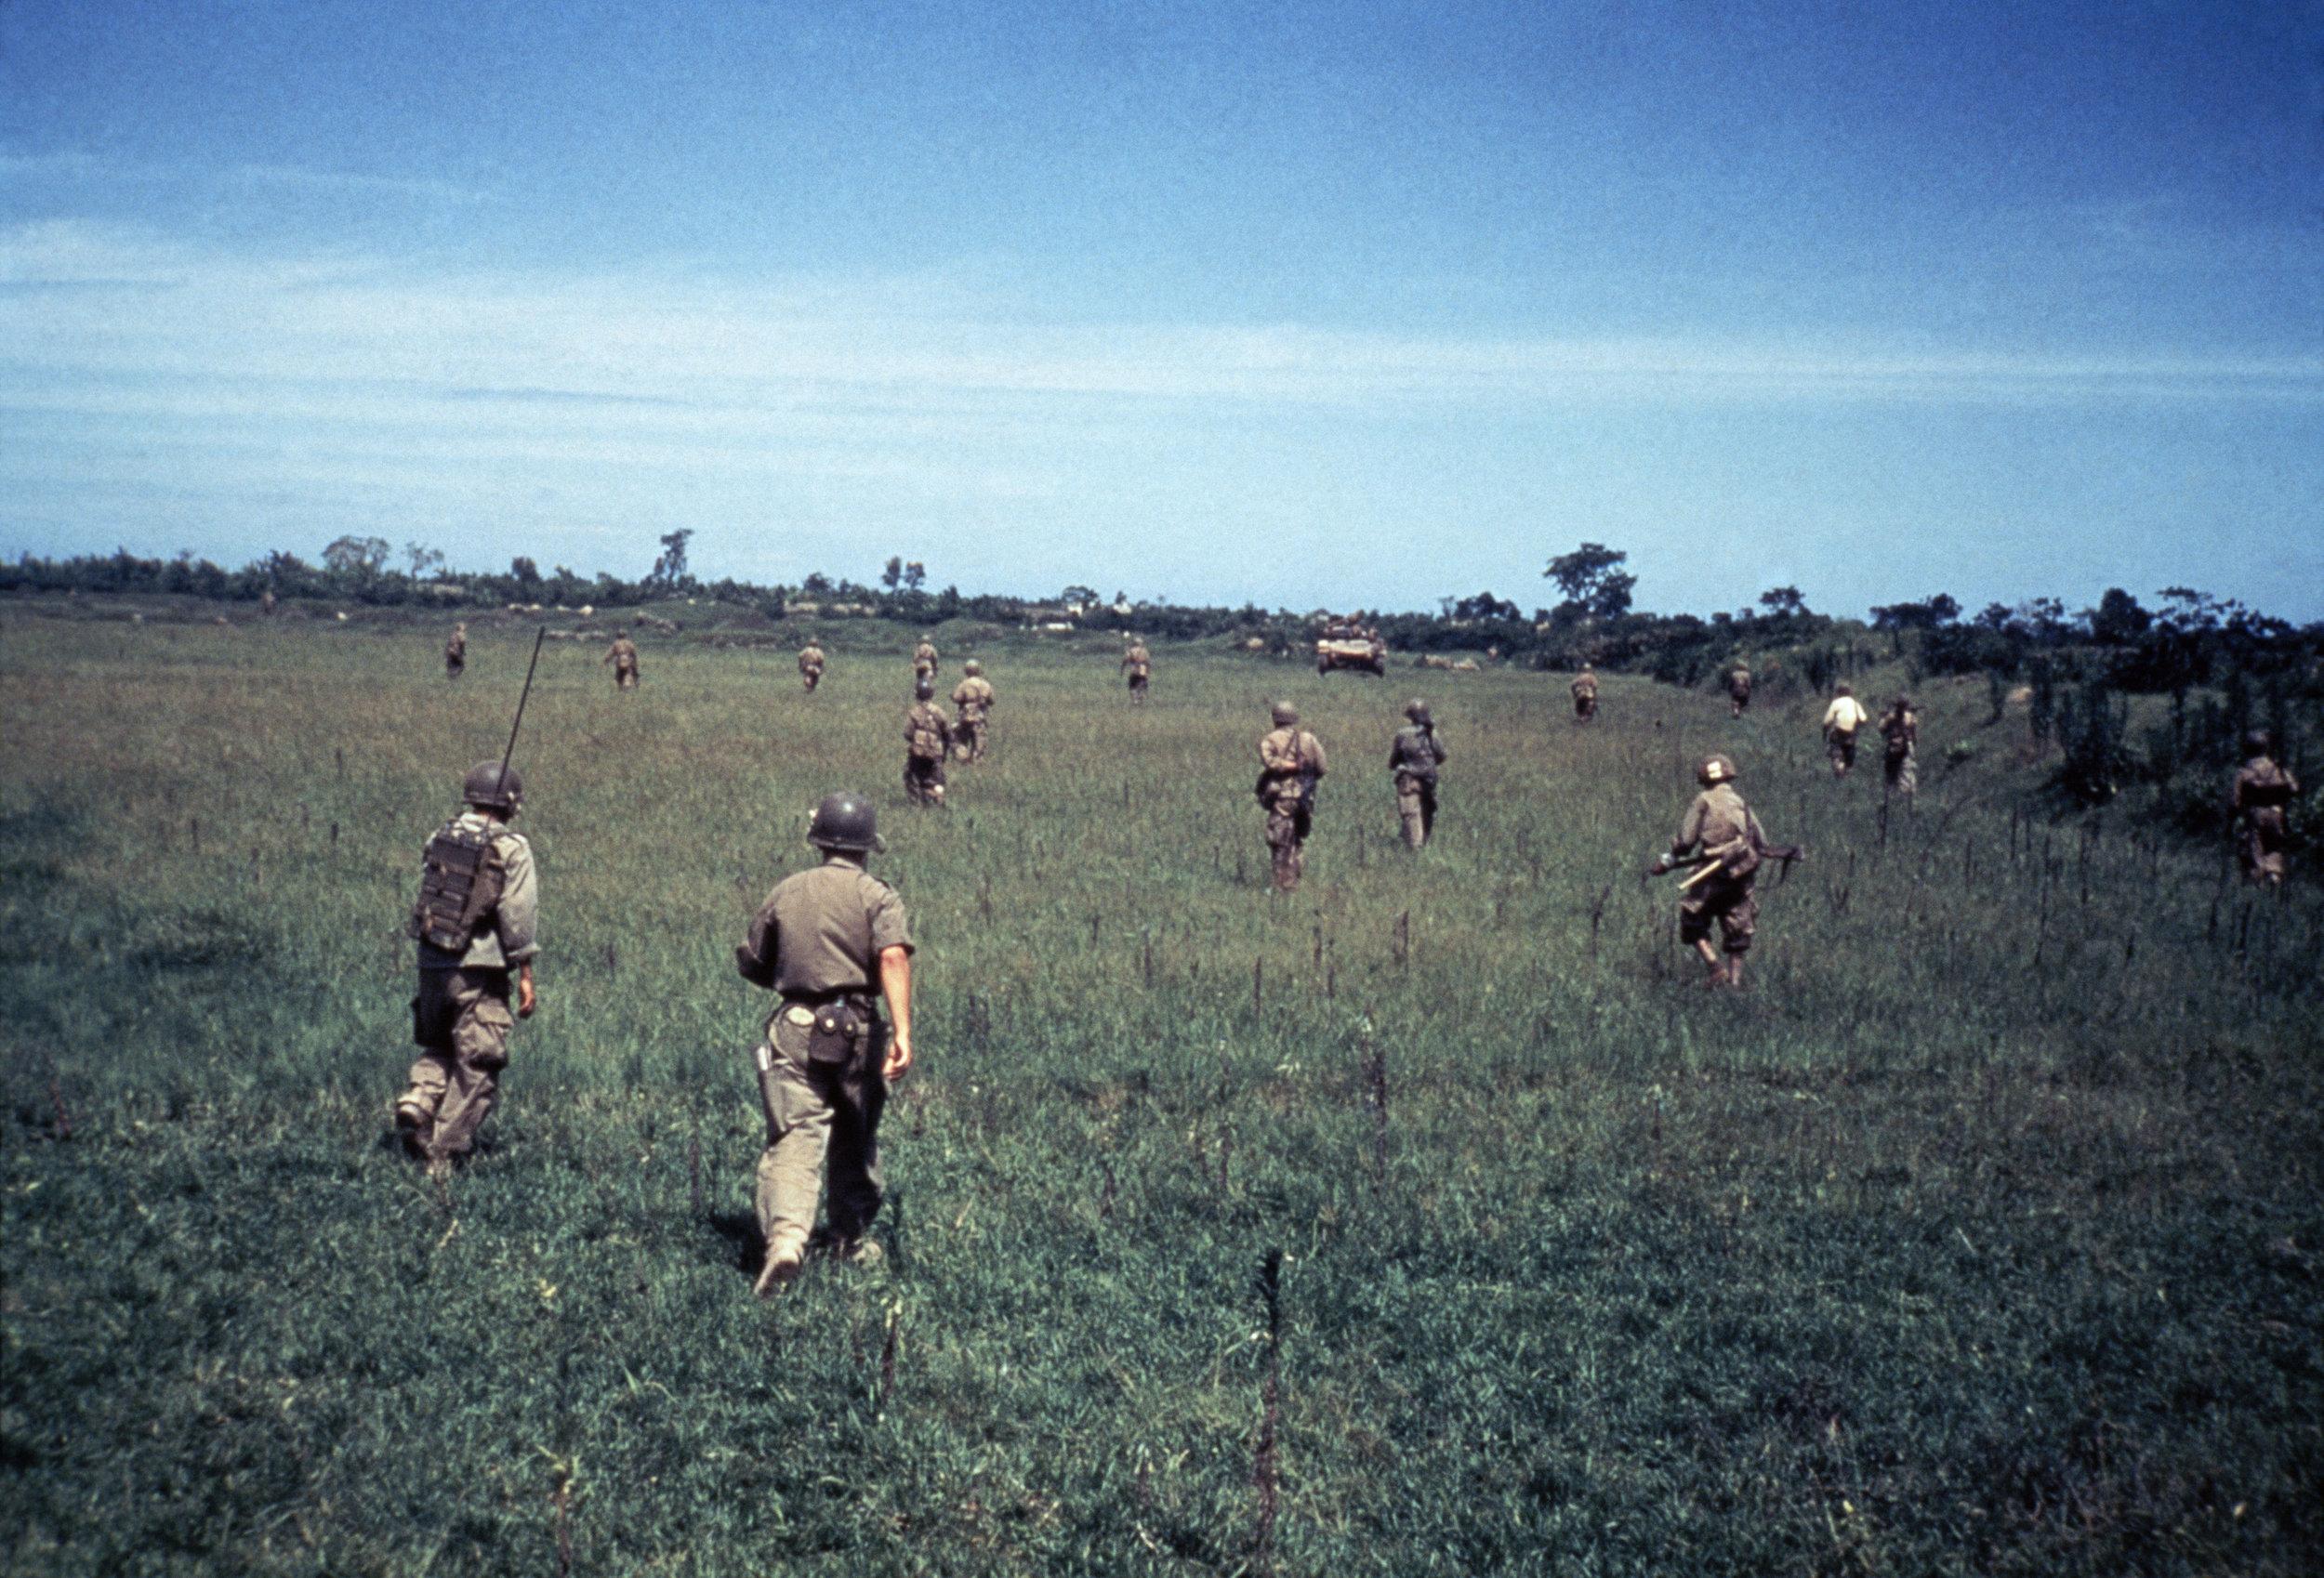 INDOCHINA. May 25, 1954. Vietnamese troops advancing between Namdinh and Thaibinh. Photo by Robert Capa © International Center of Photography/Magnum Photos